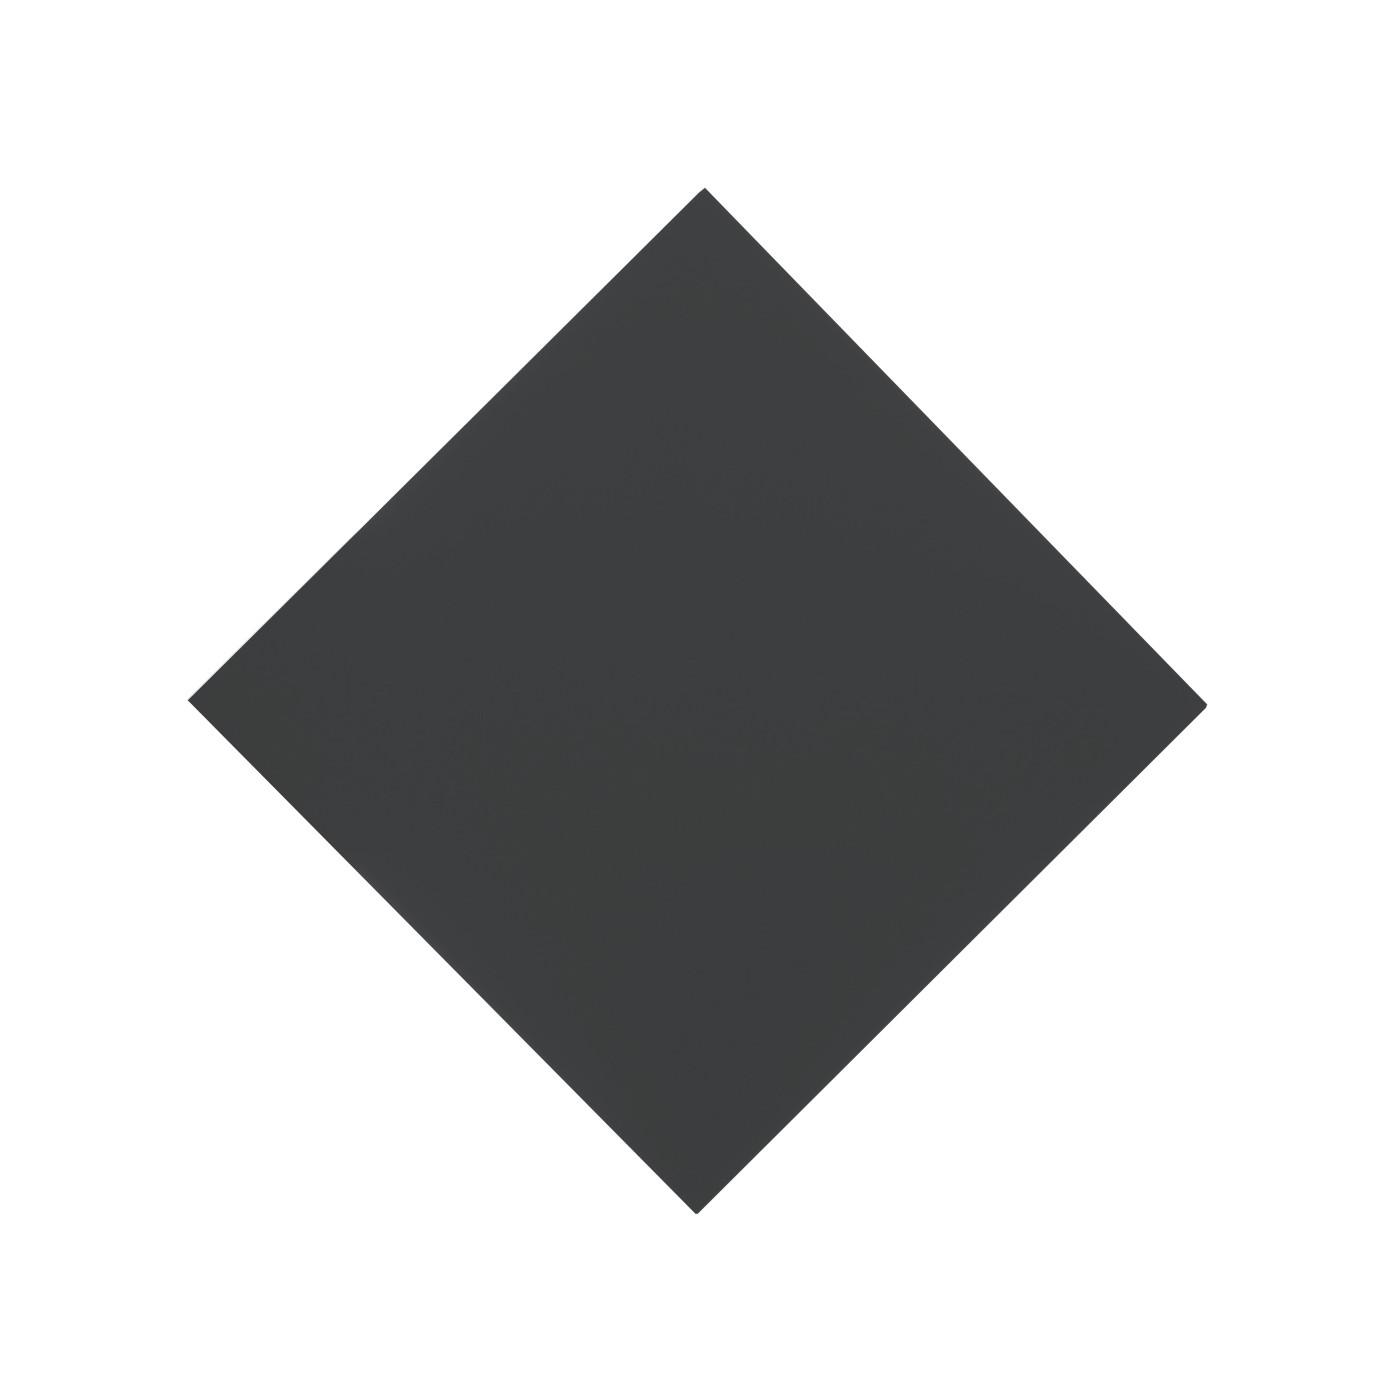 Studio Italia Design Puzzle Single Square Außenwandleuchte